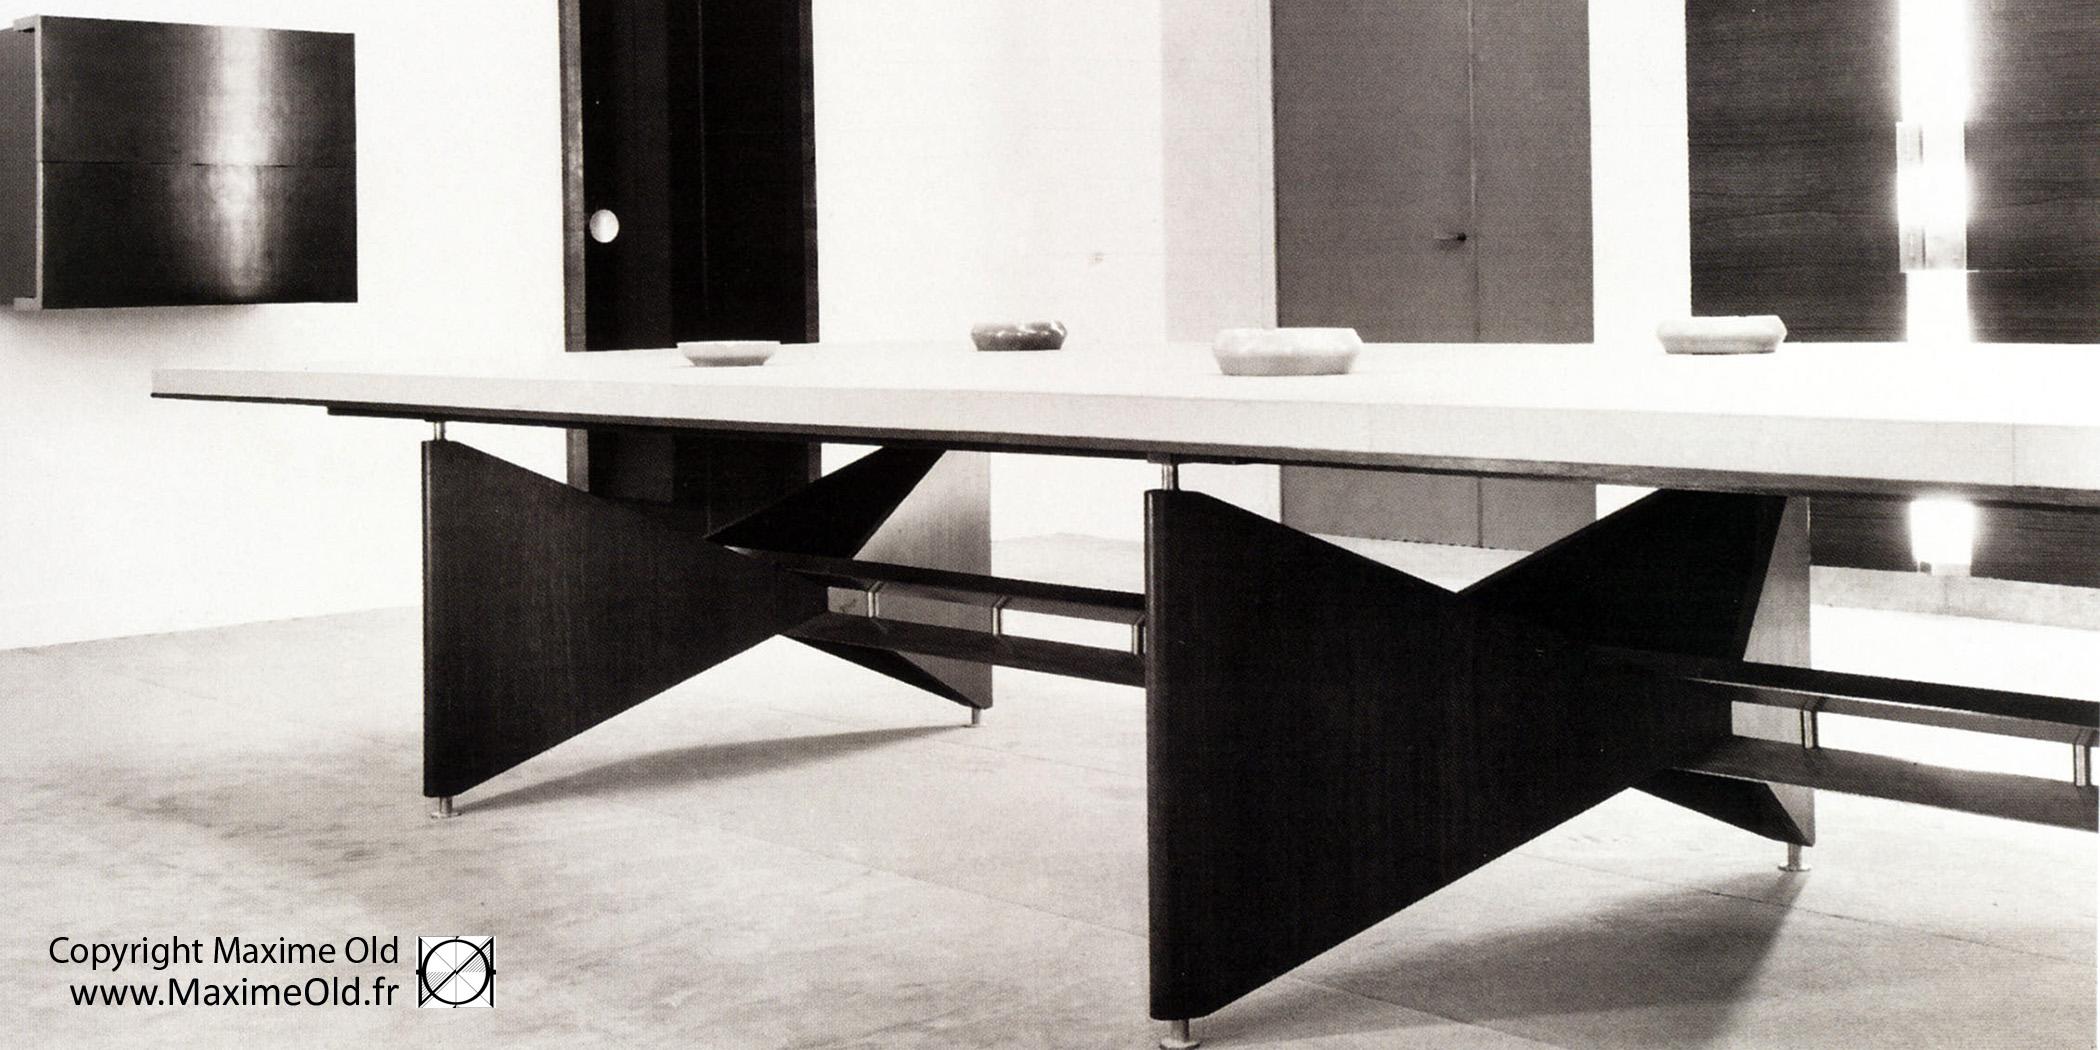 Maxime Old Tables-Desks